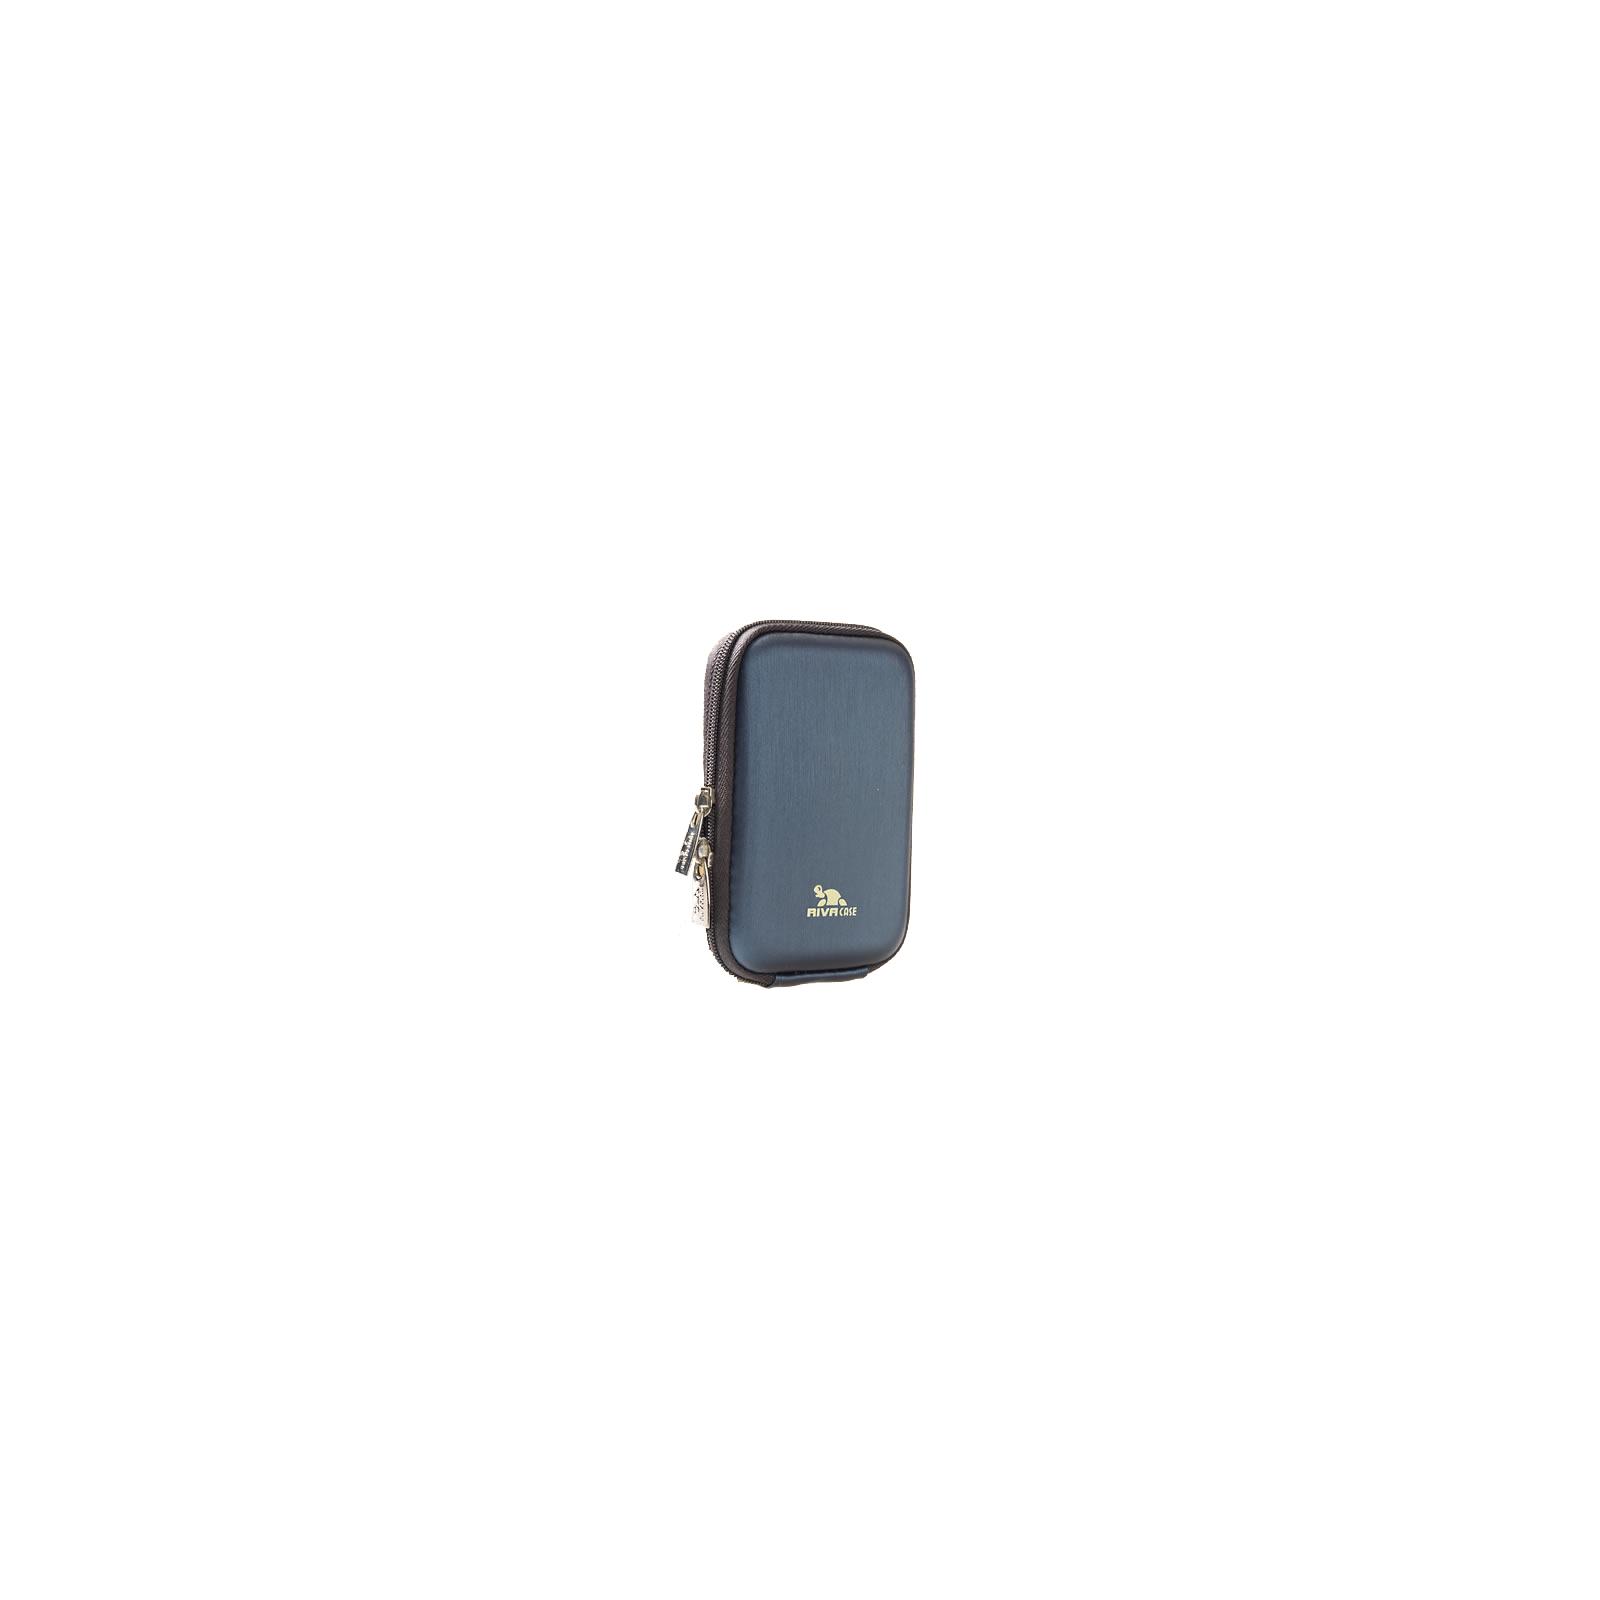 Фото-сумка RivaCase Digital Case (7062PU mazarine)